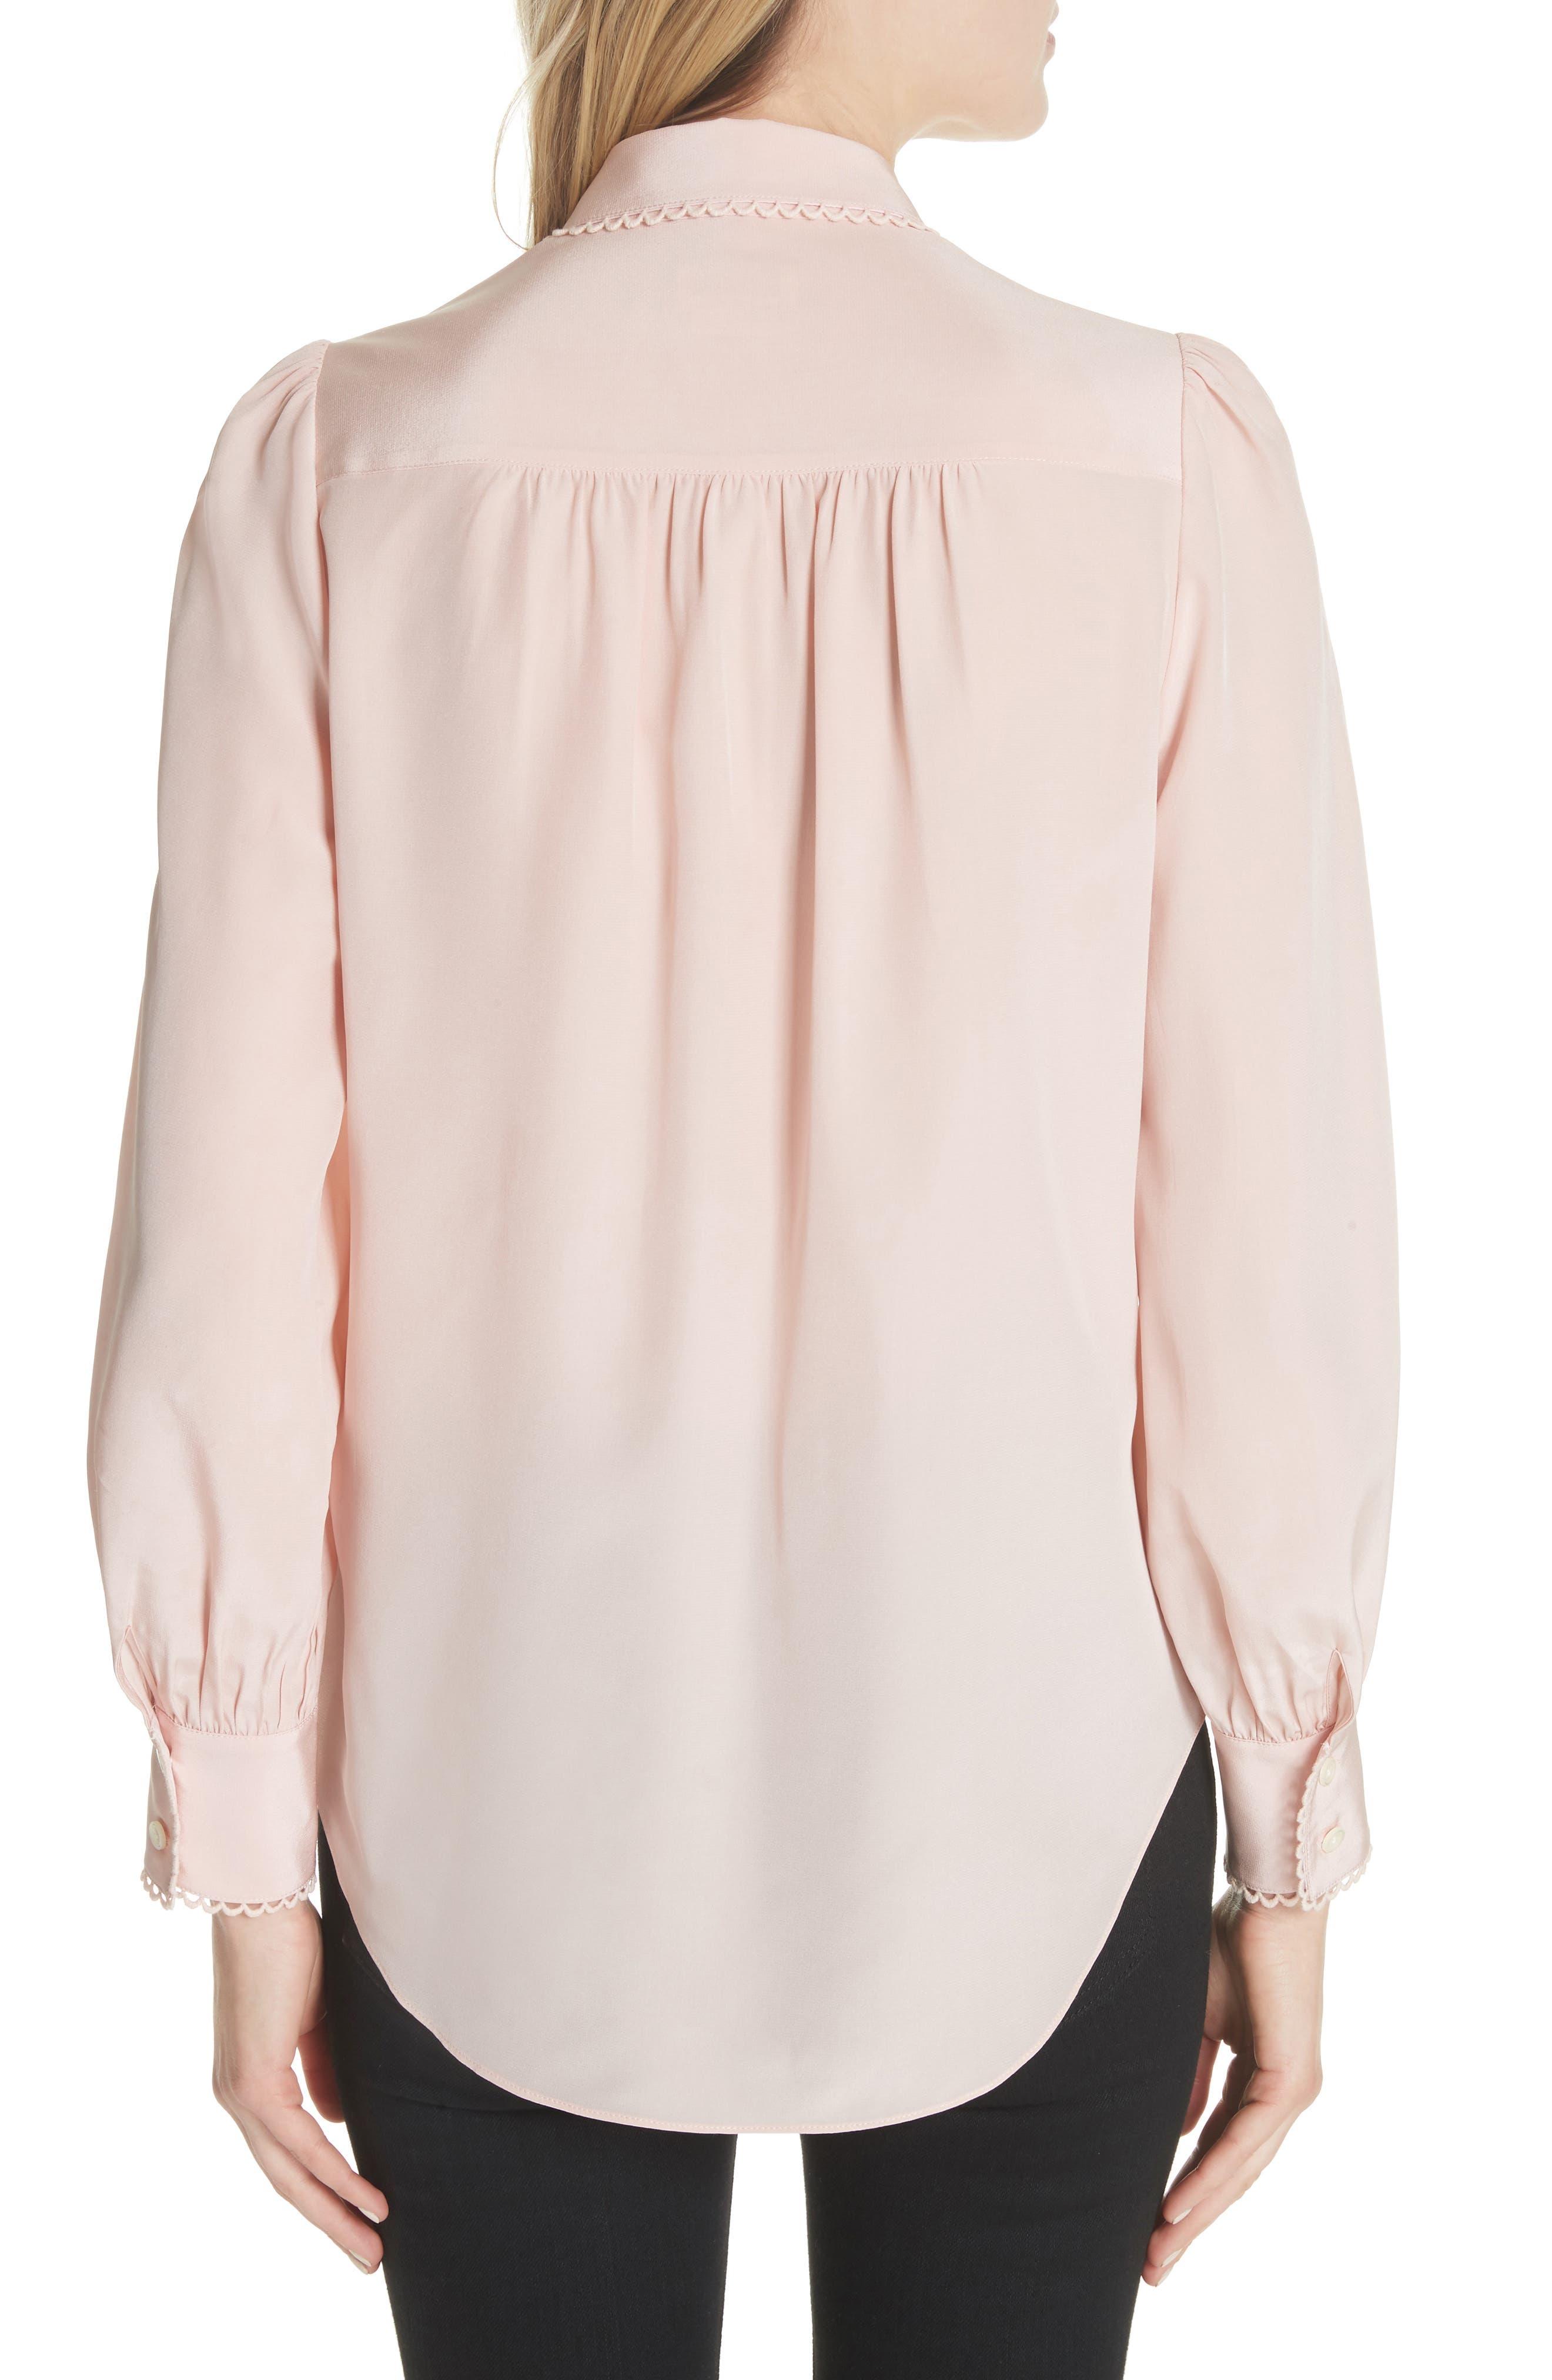 KATE SPADE NEW YORK,                             scallop trim silk shirt,                             Alternate thumbnail 2, color,                             663